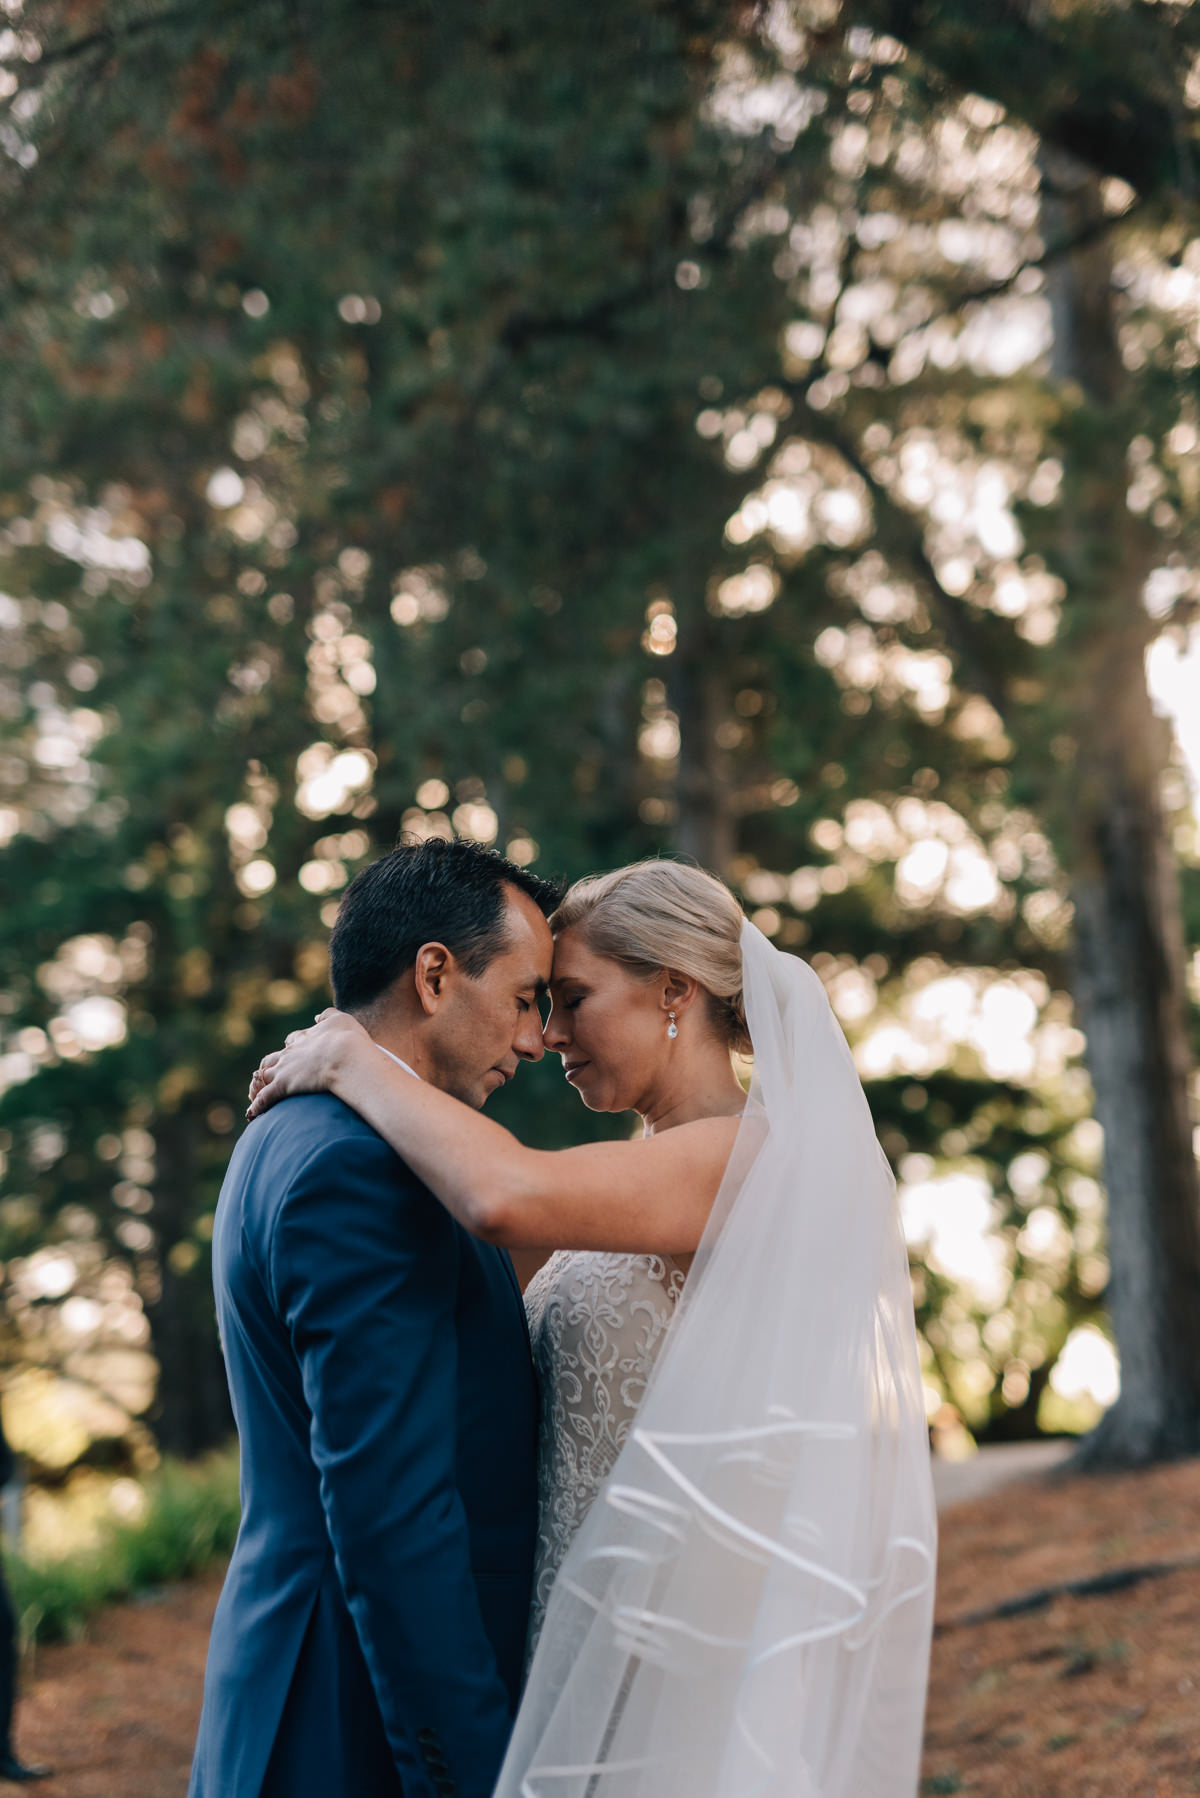 Wedding-Photohraphy-Tasmania-Josef-Chromy-59.jpg